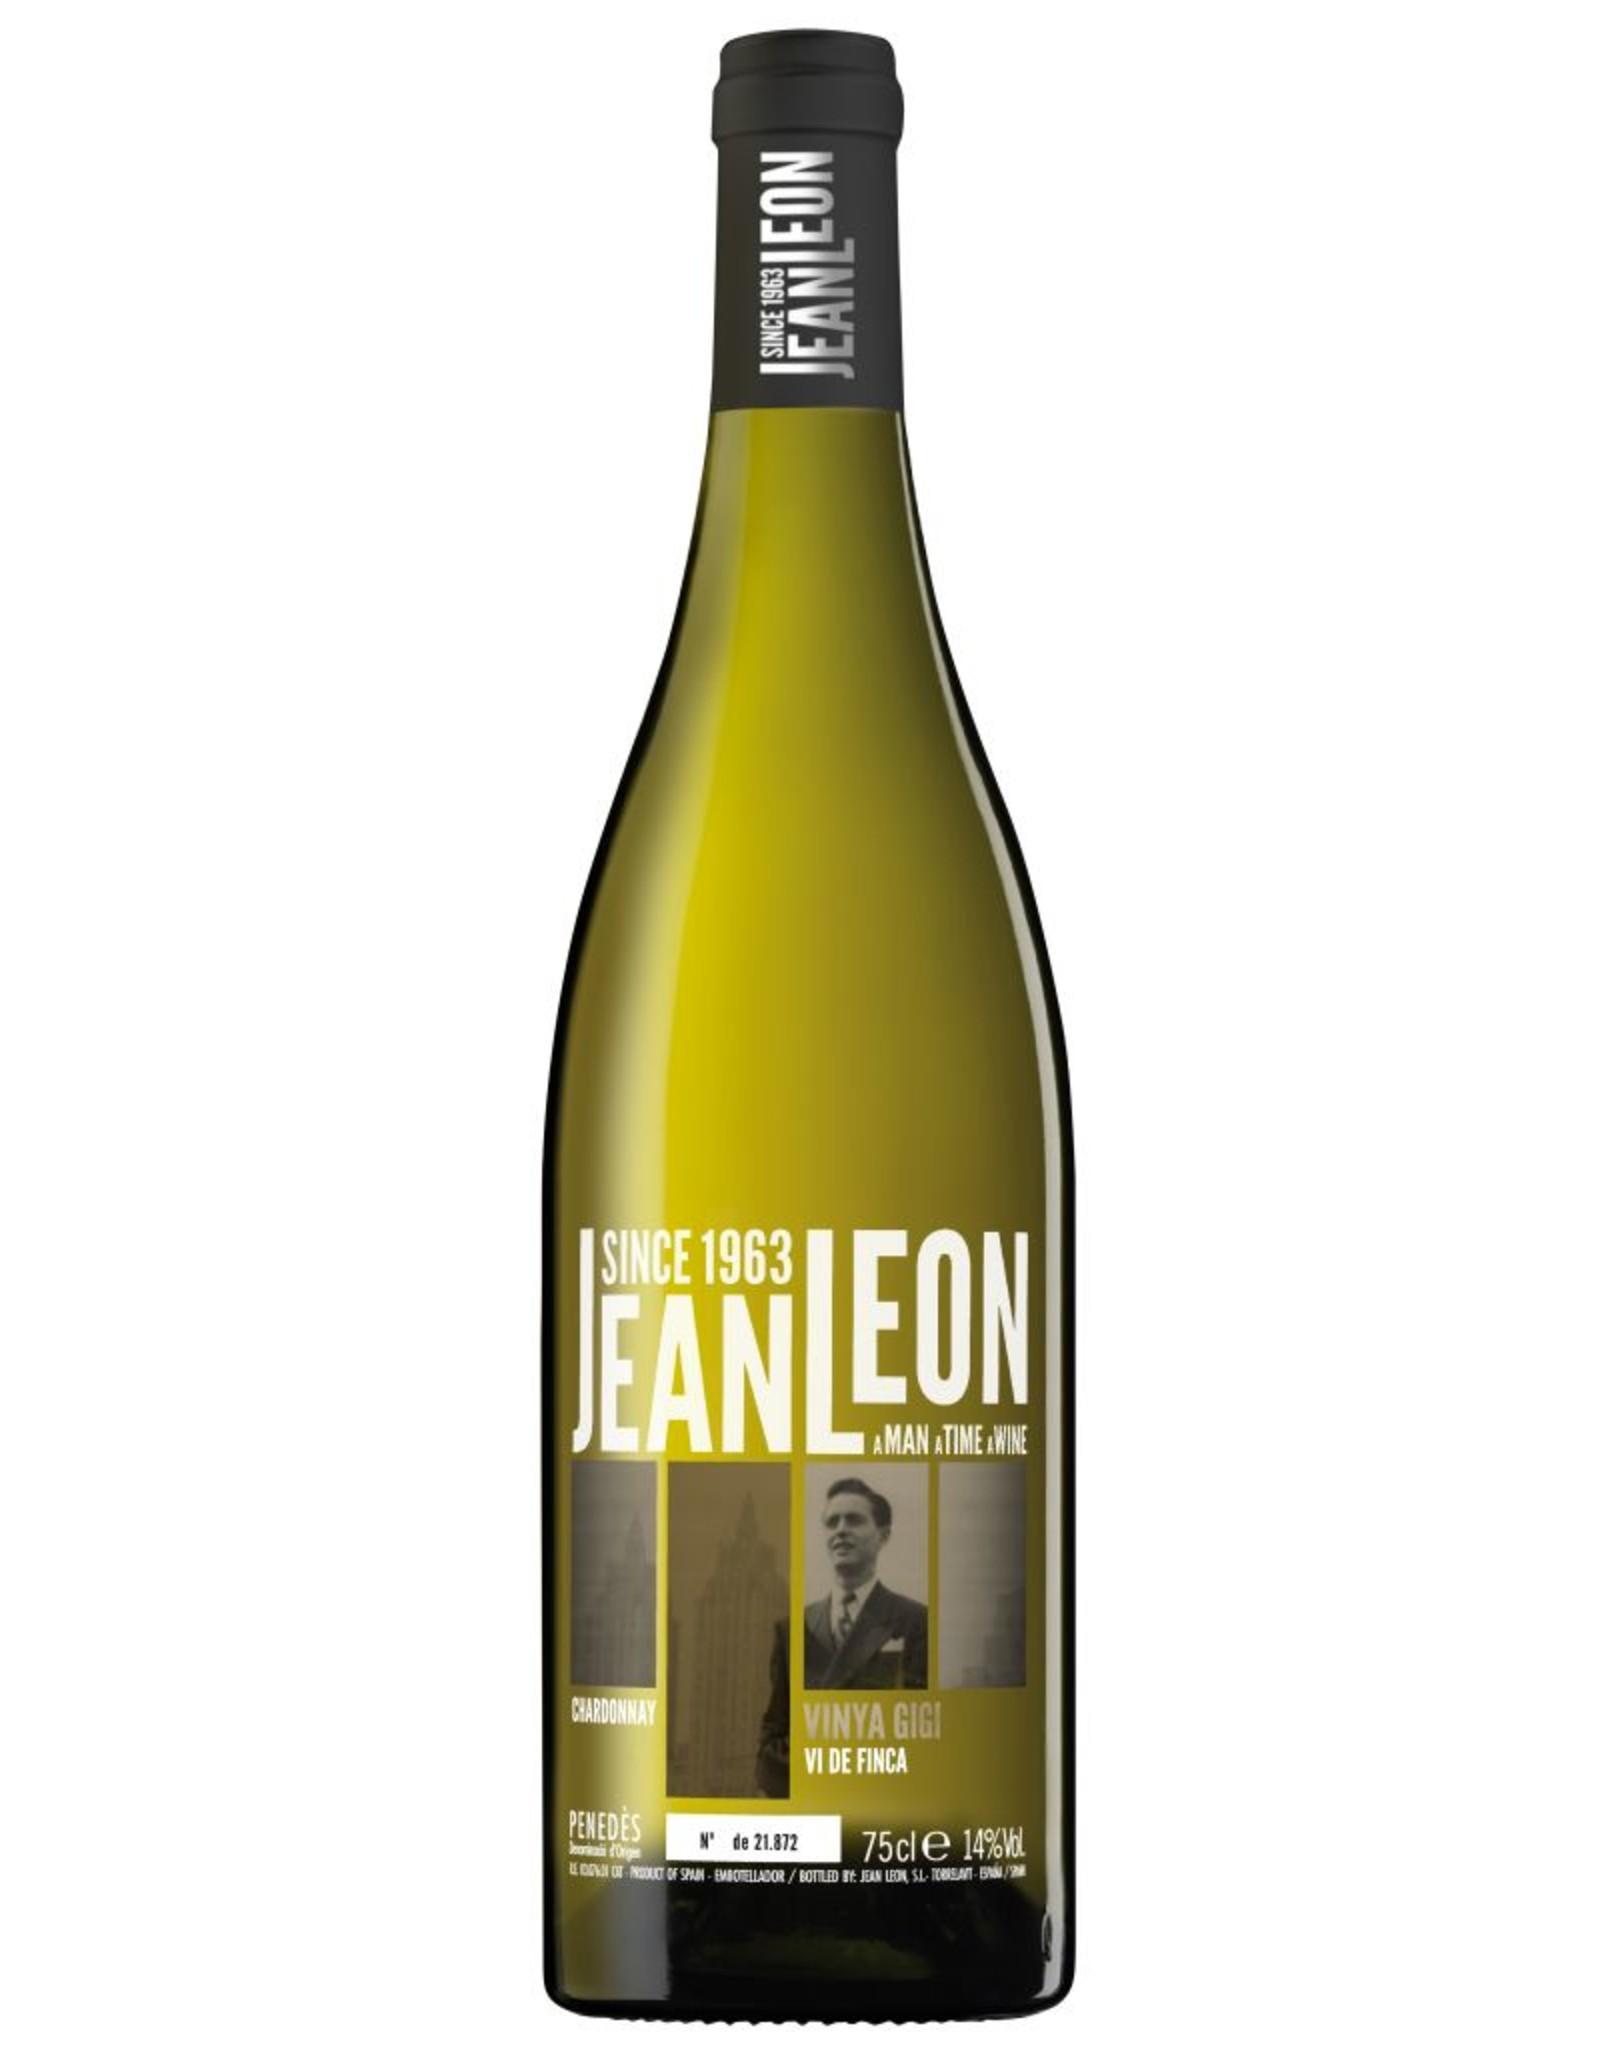 Jean Leon, 3055 Vinya Gigi Chardonnay Single Vineyard